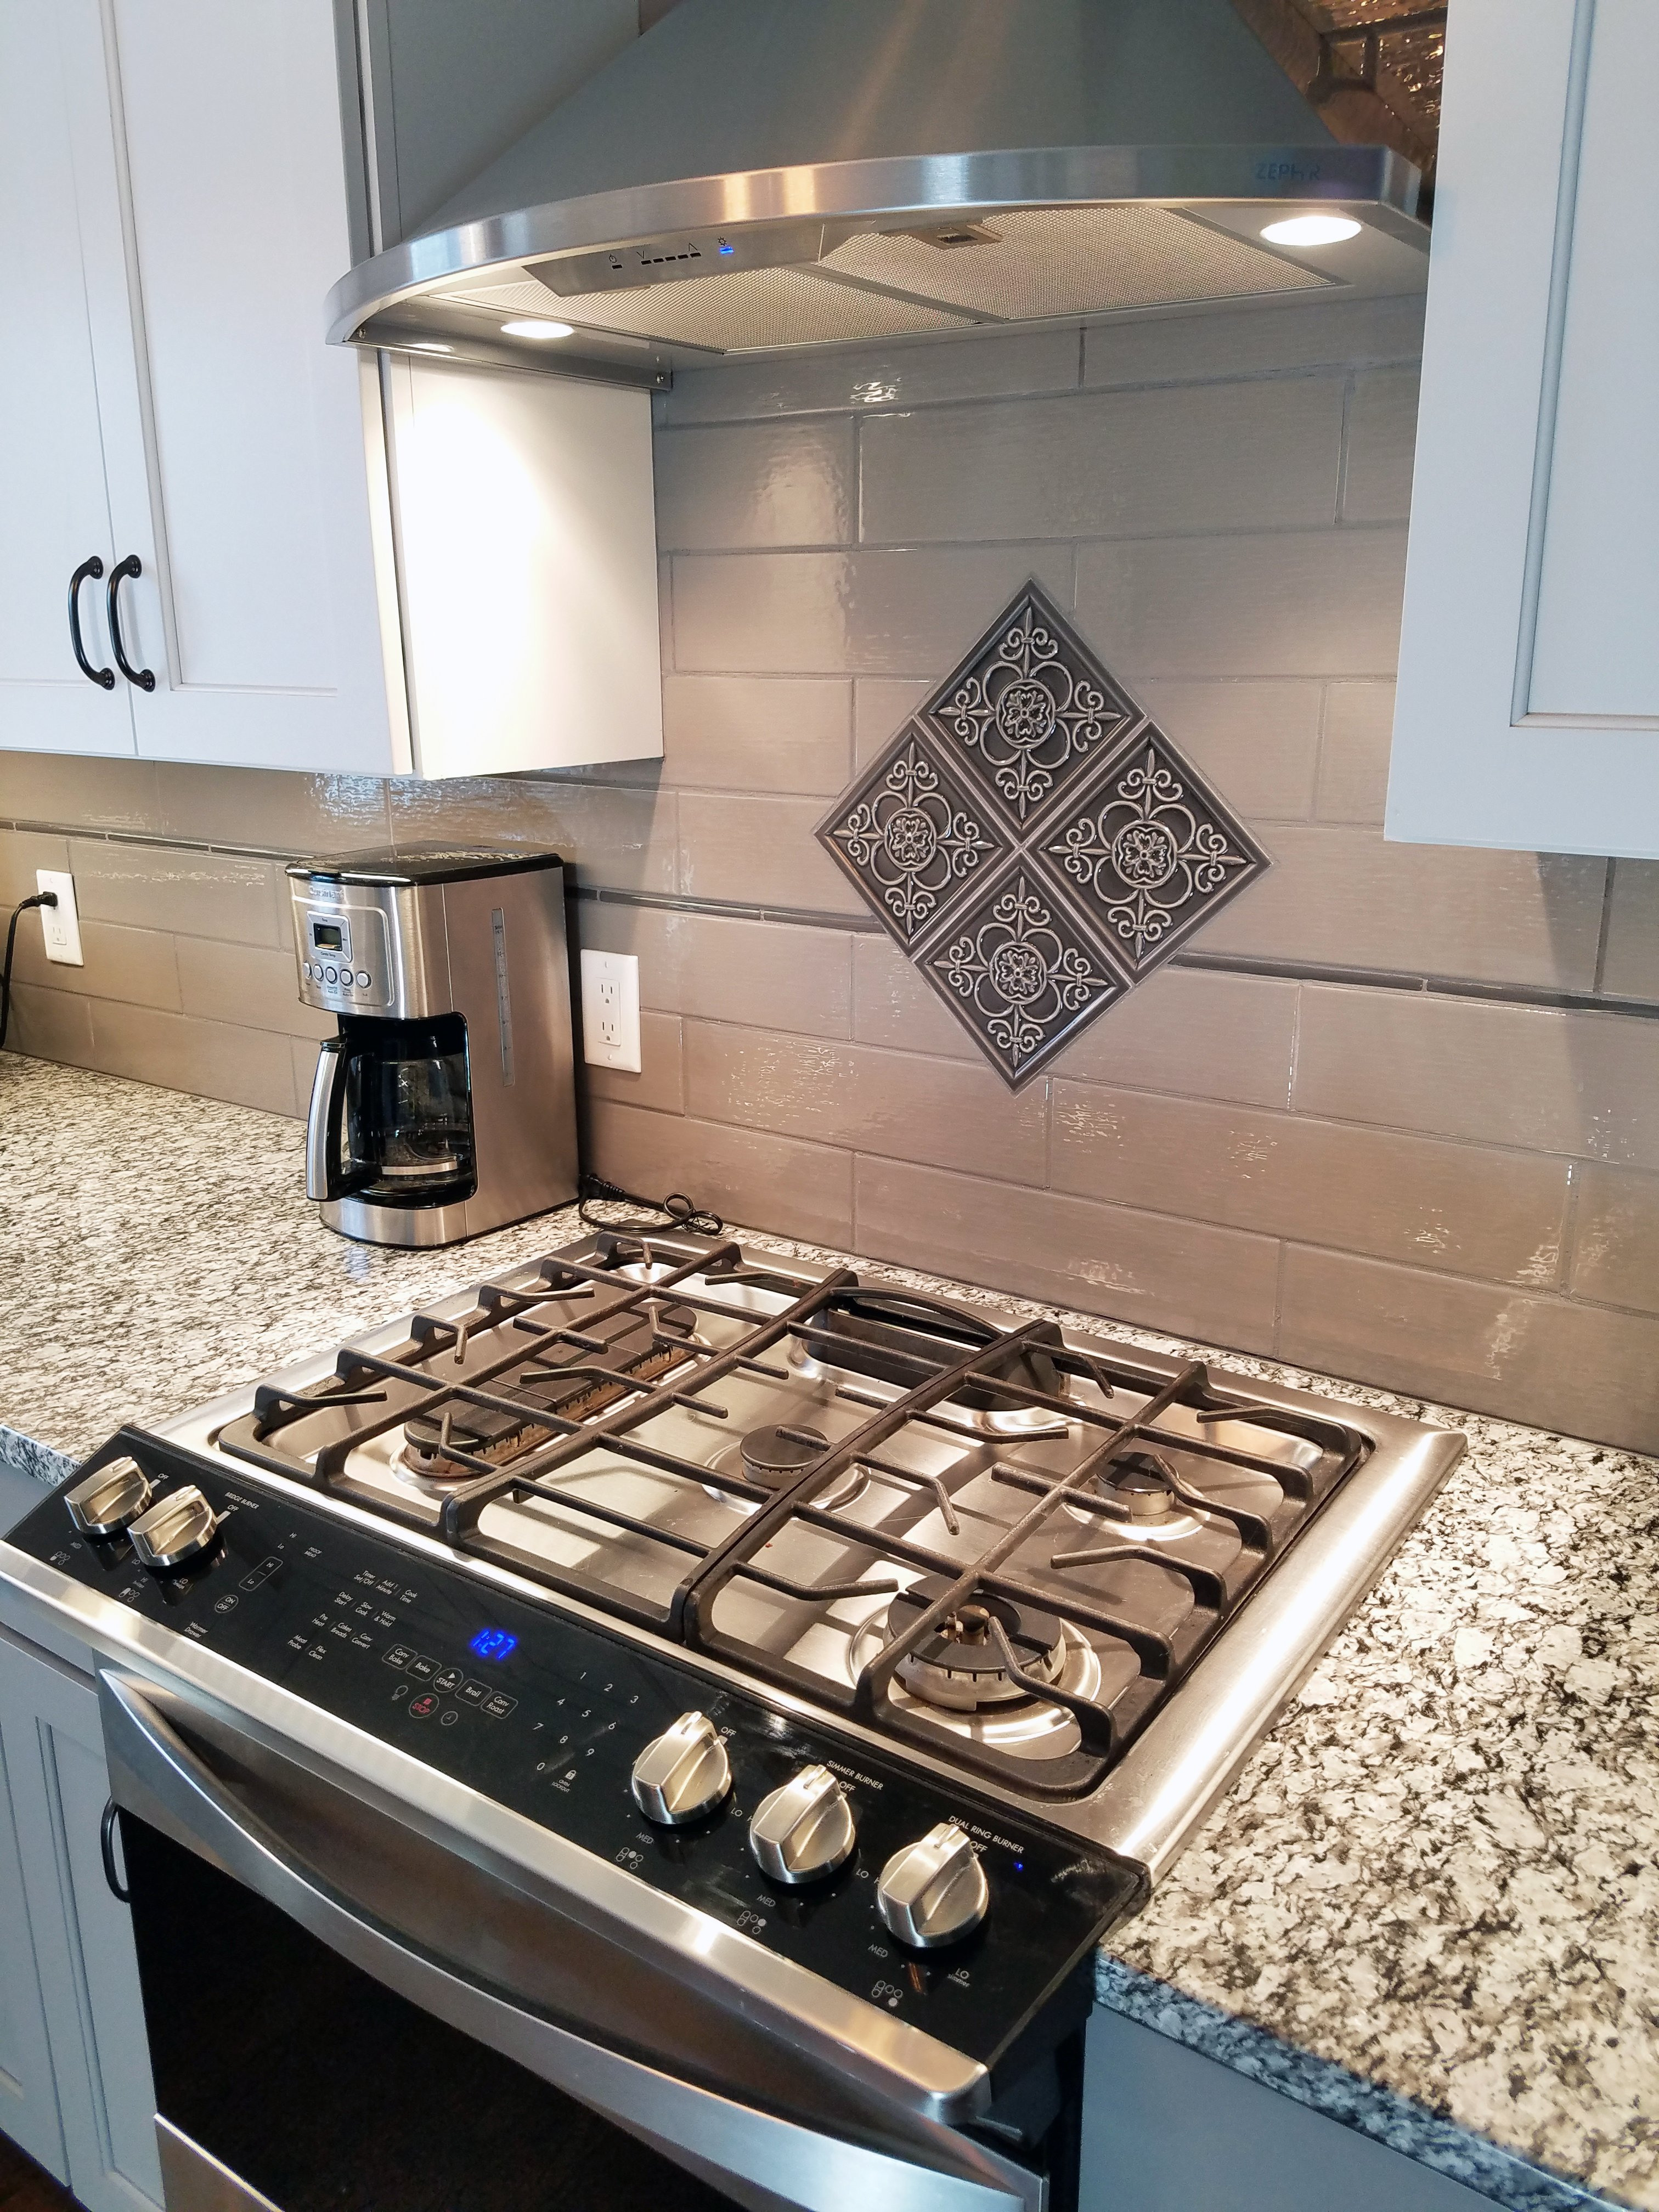 Kitchen Remodeling and Design, fleur de lis kitchen accent, medallion above the stove, gas stove,